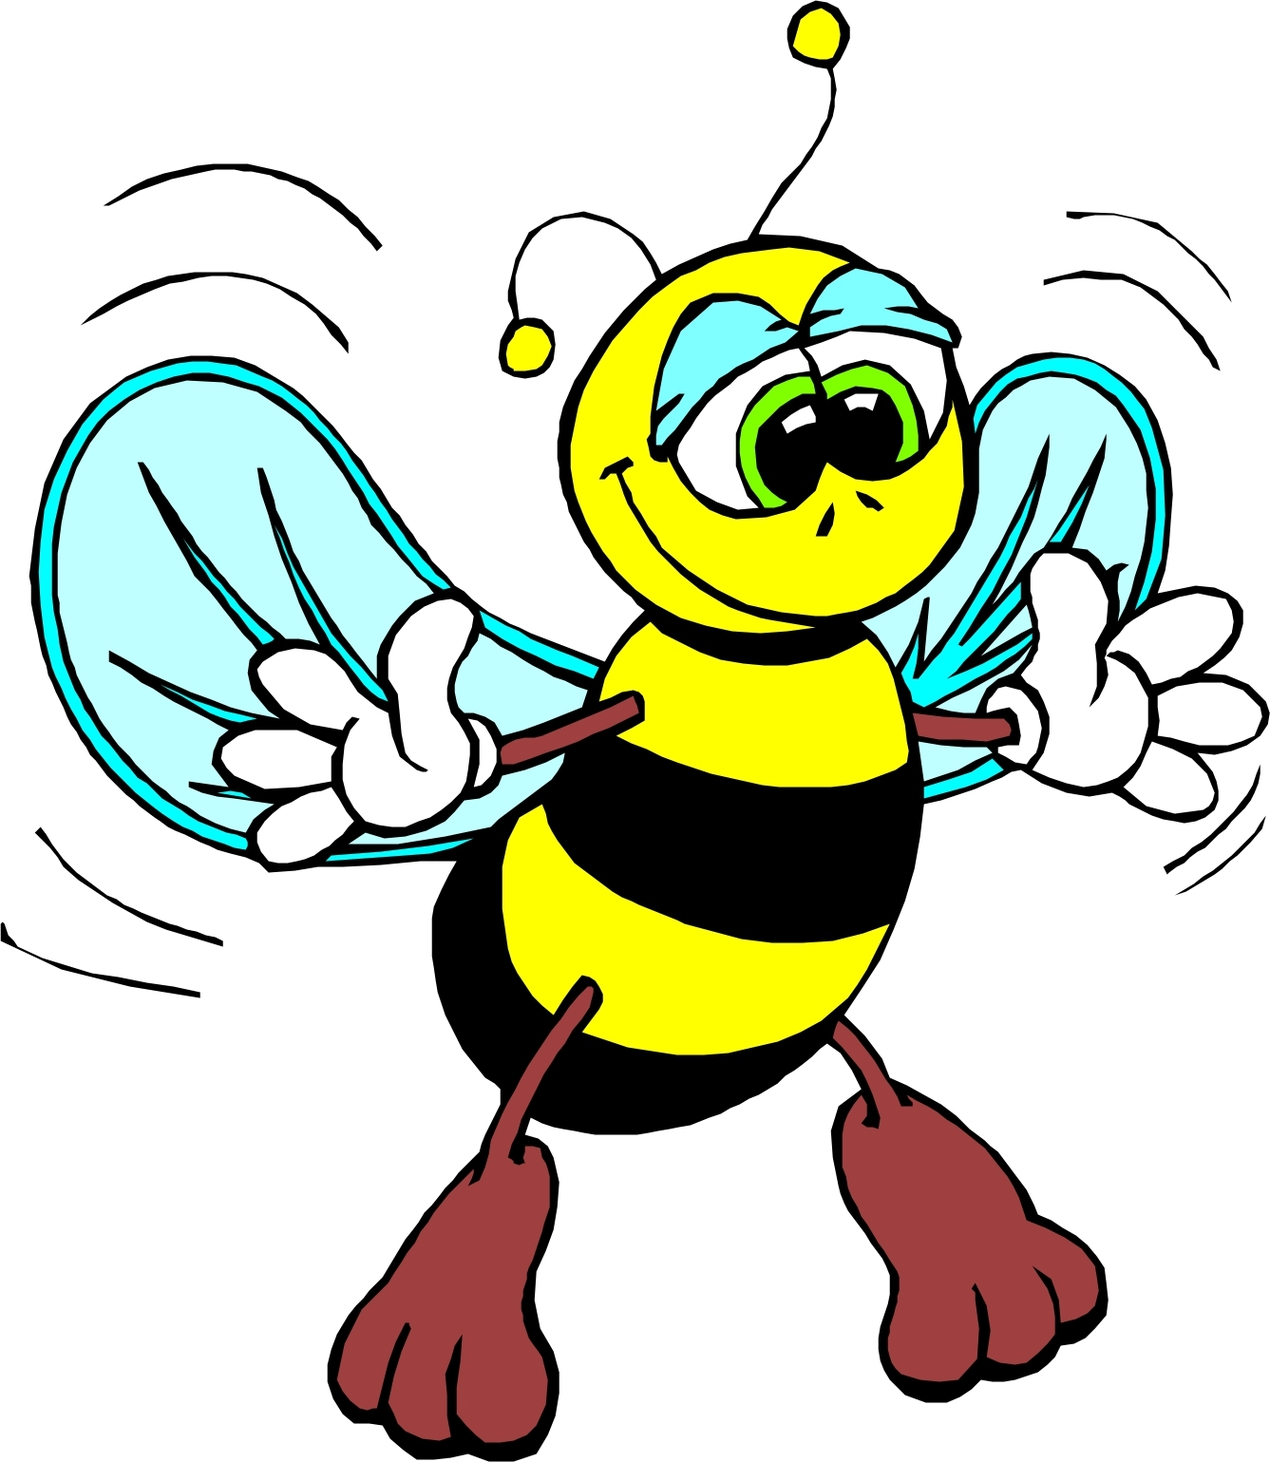 Honey Bee Cartoon - ClipArt Best